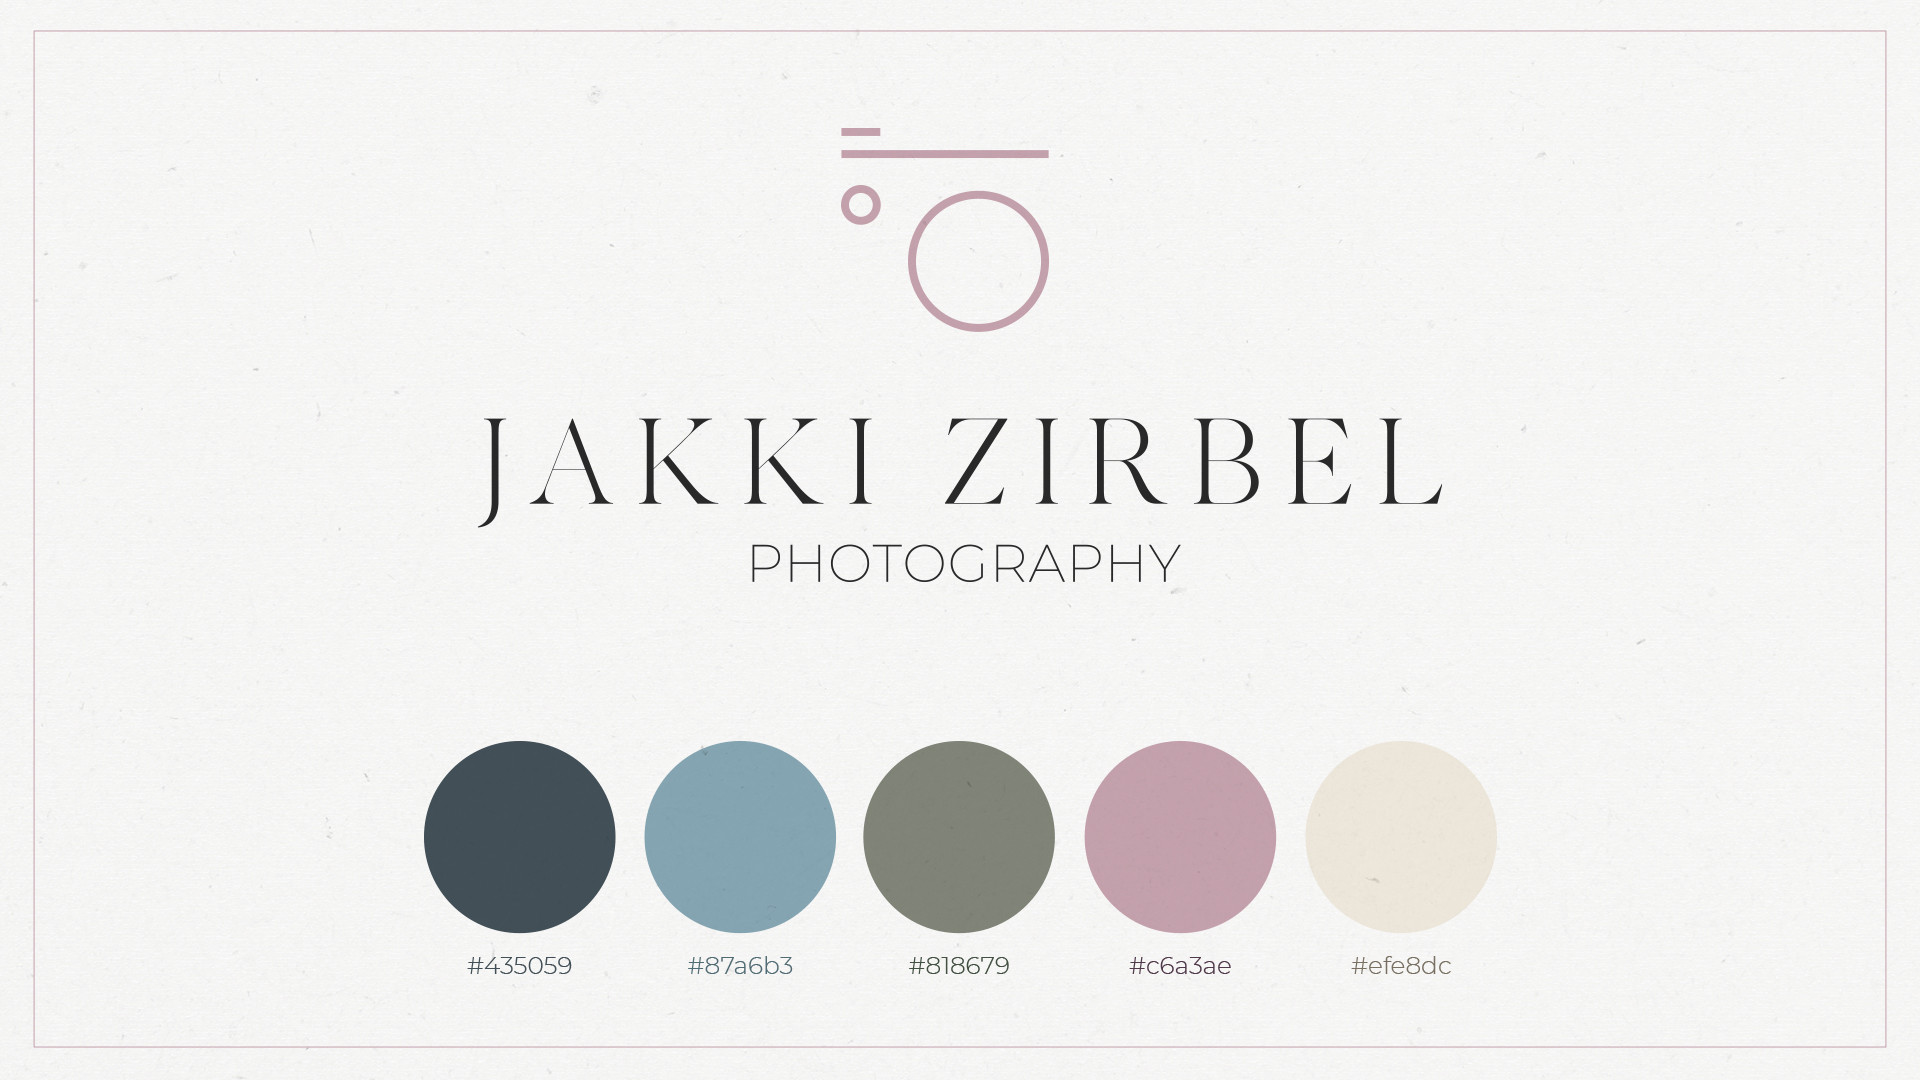 Jakki Zirbel Photography